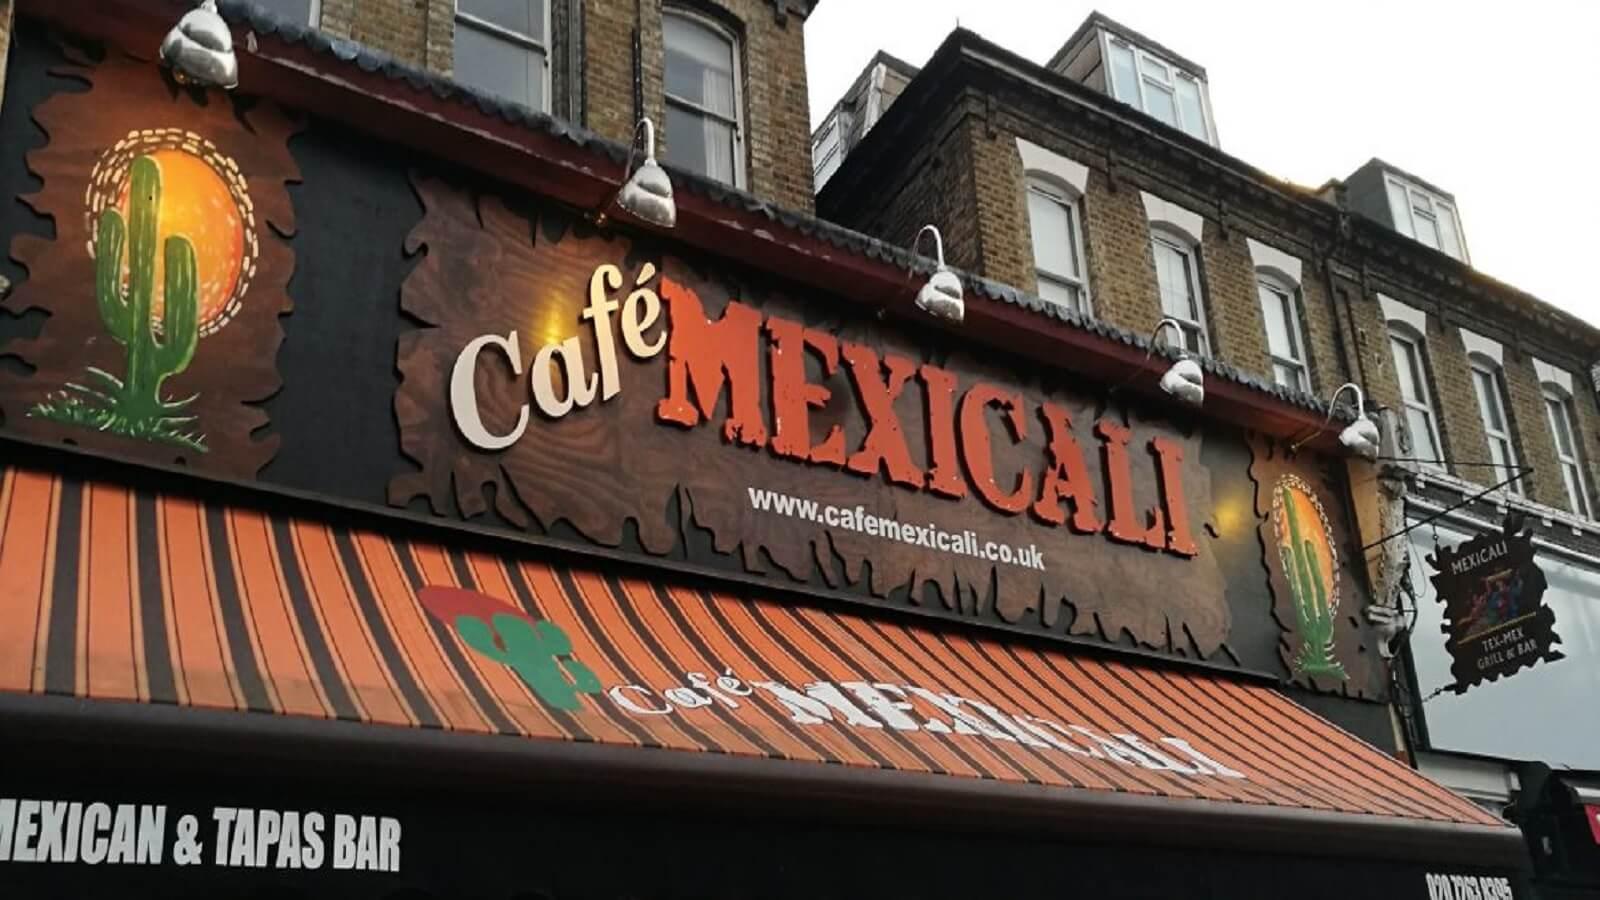 Cafe Mexicali